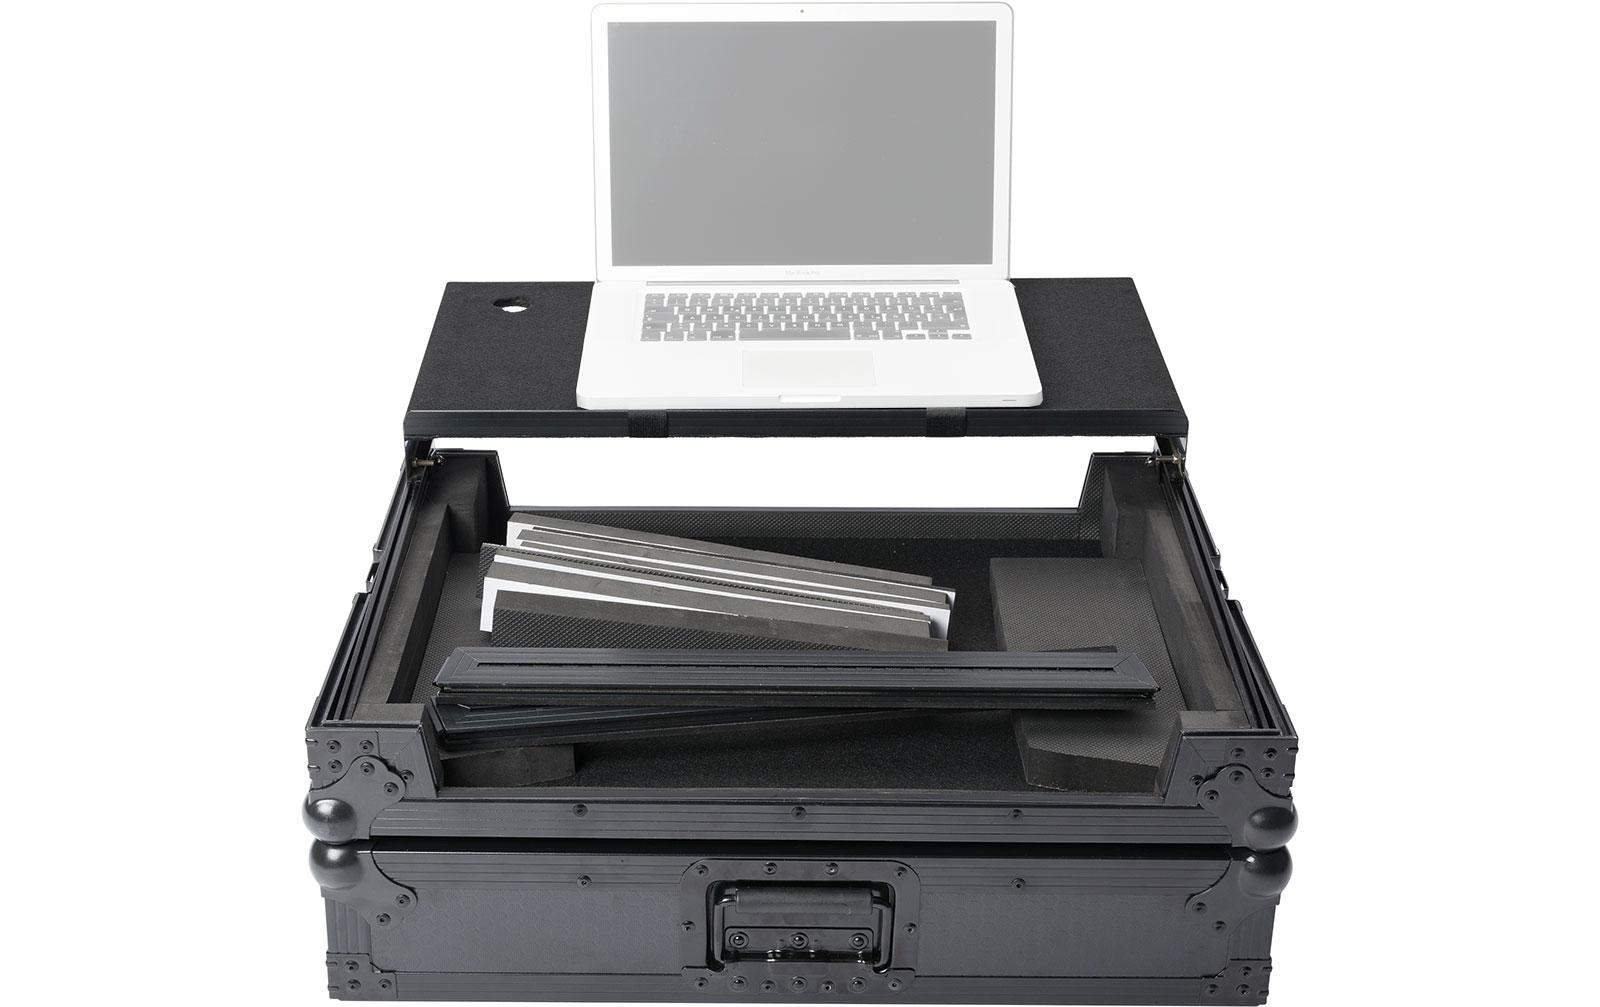 magma-multi-format-workstation-xl-plus-black-black